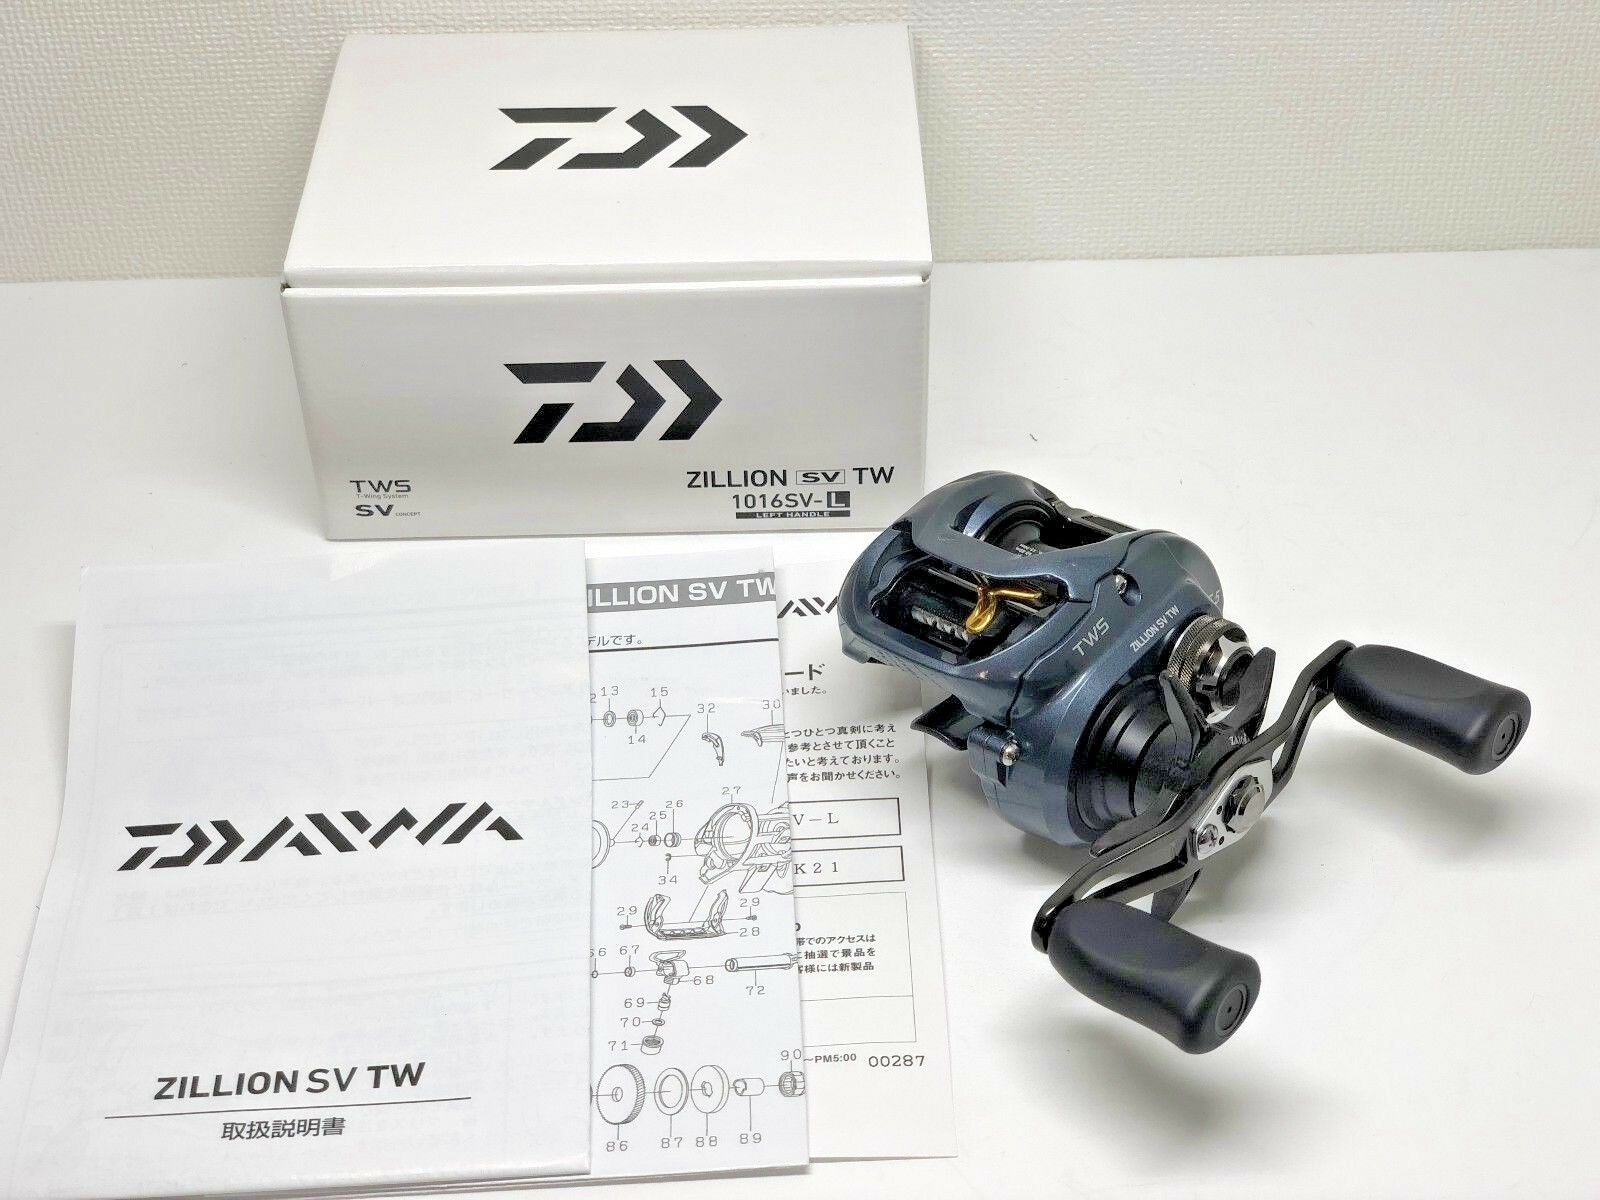 DAIWA 16 ZILLION SV TW 1016SV-L   - Free Shipping from Japan